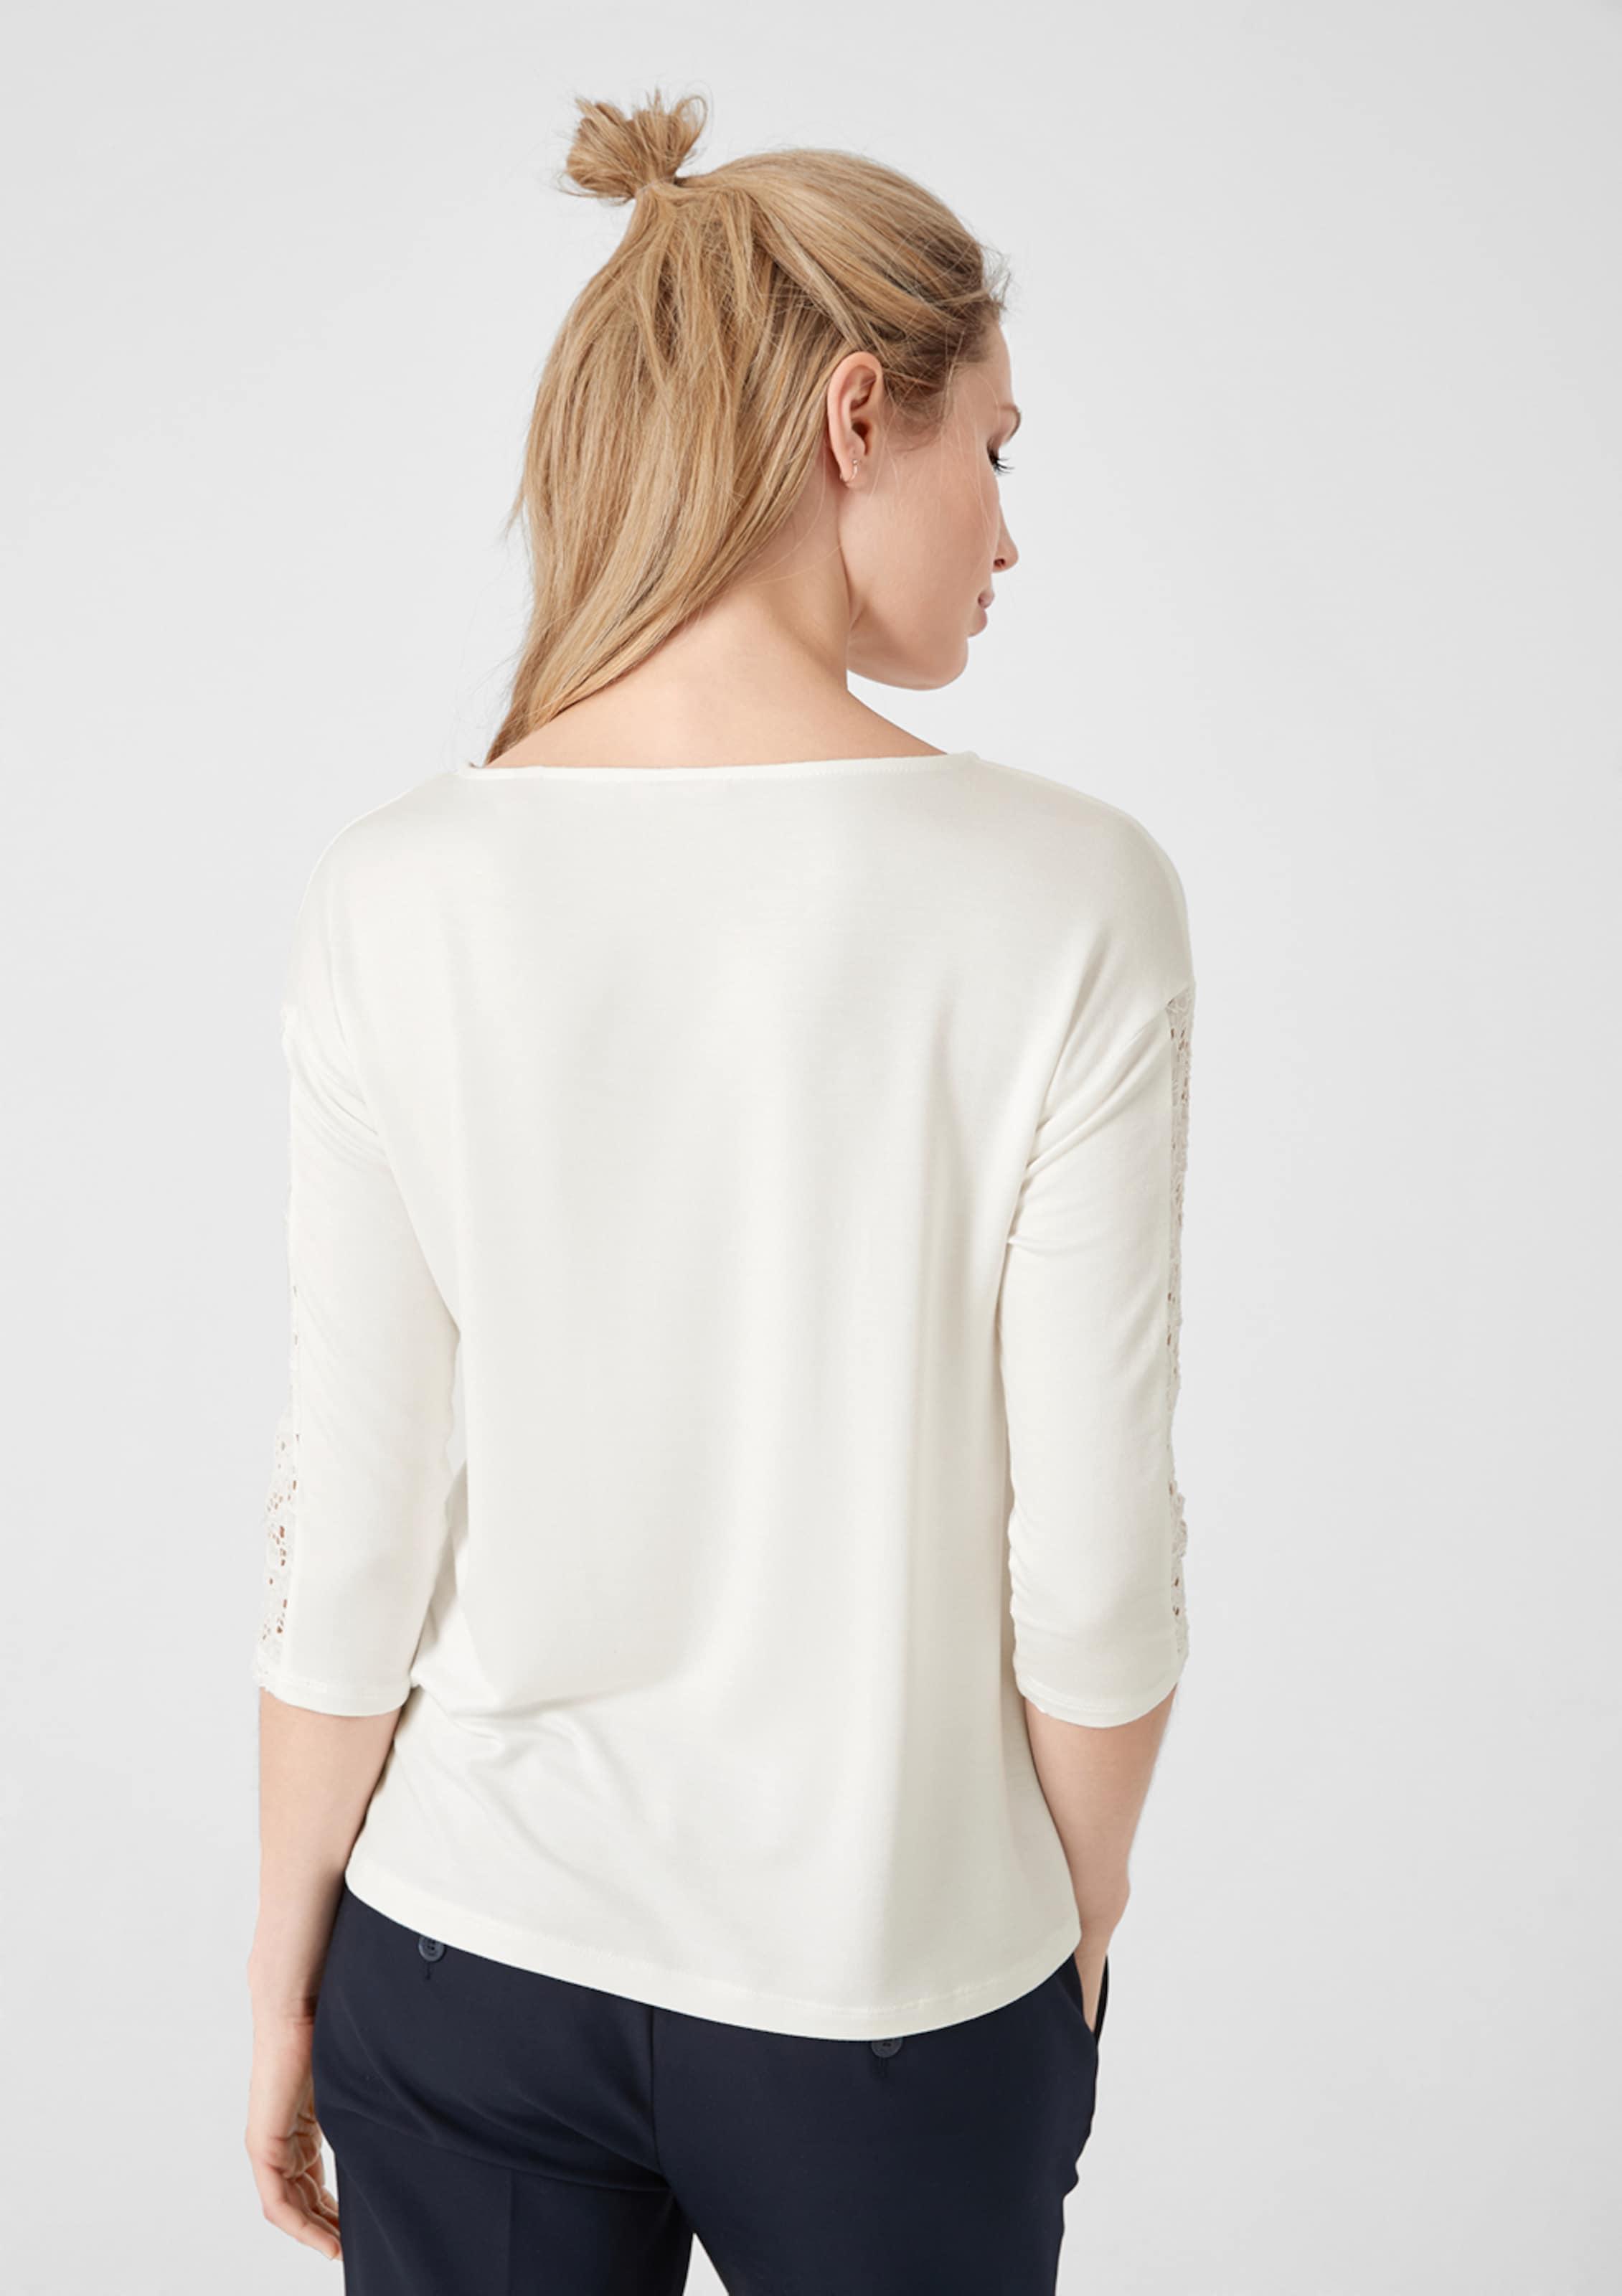 In Shirt Weiß oliver S nk8w0PO